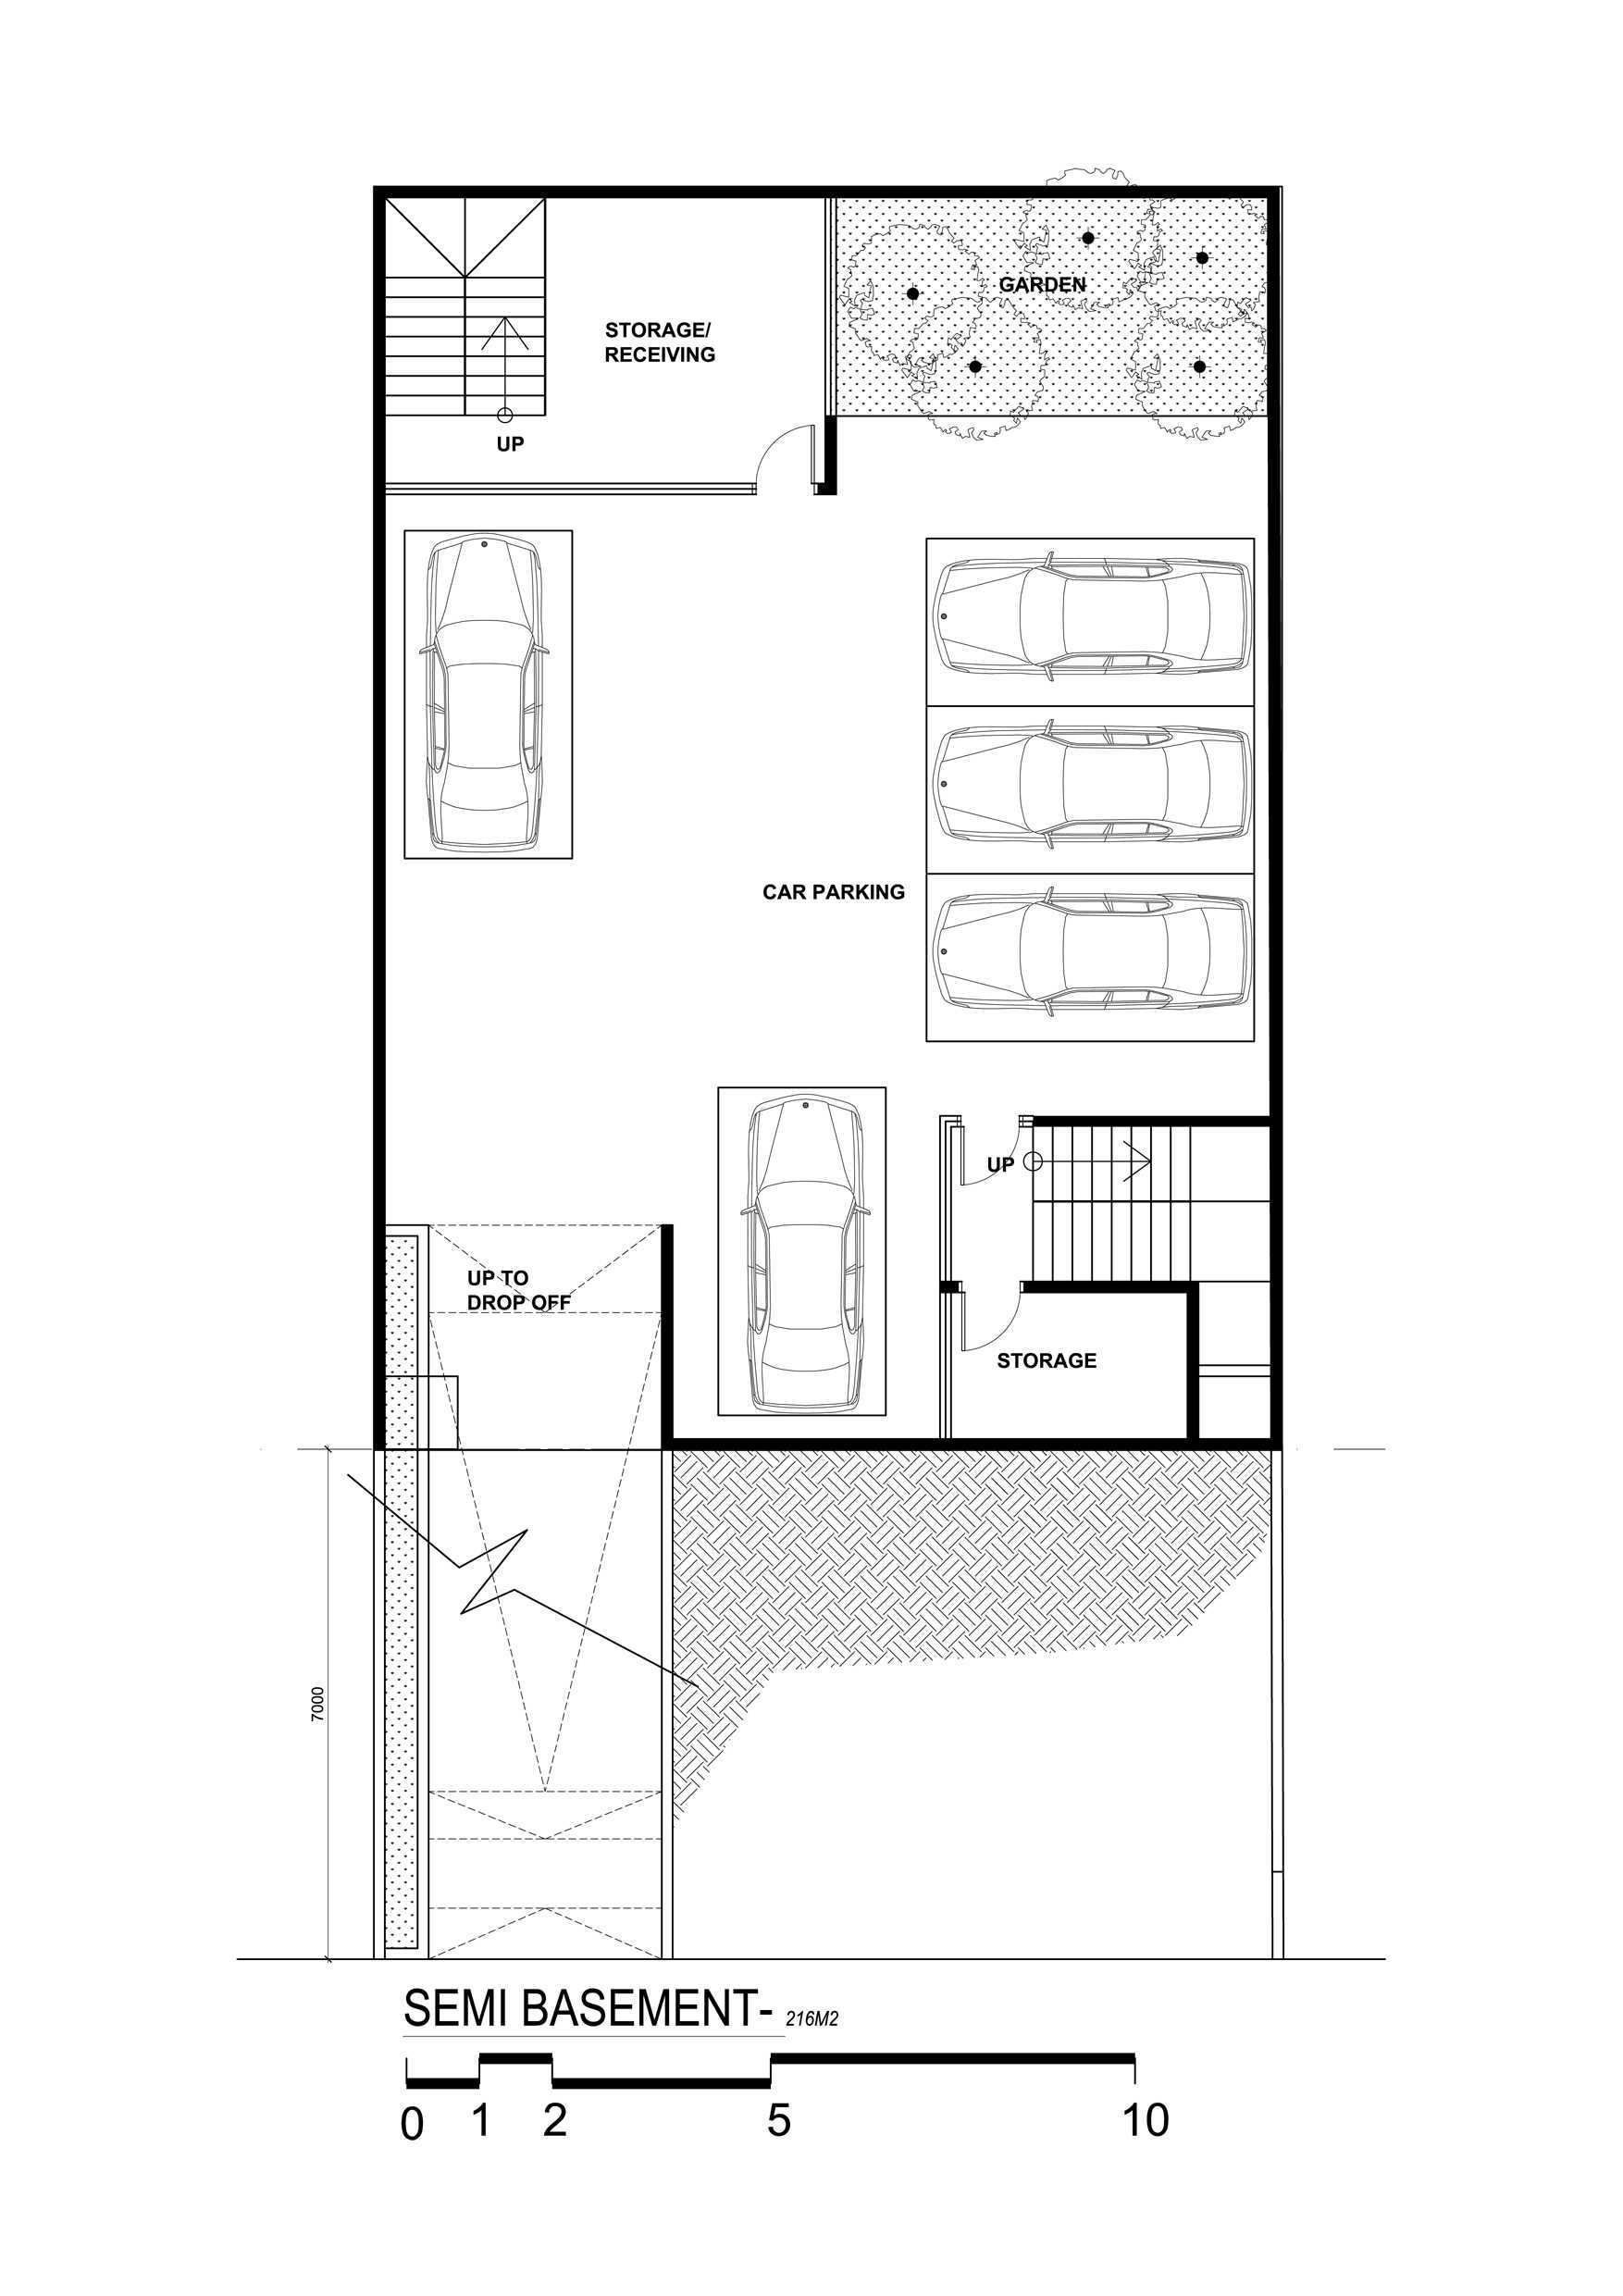 Bral Architect Senopati Terrace Jl. Suryo, Rt.6/rw.3, Senayan, Kby. Baru, Kota Jakarta Selatan, Daerah Khusus Ibukota Jakarta 12190, Indonesia Senopati, Jakarta Plan Modern  24928